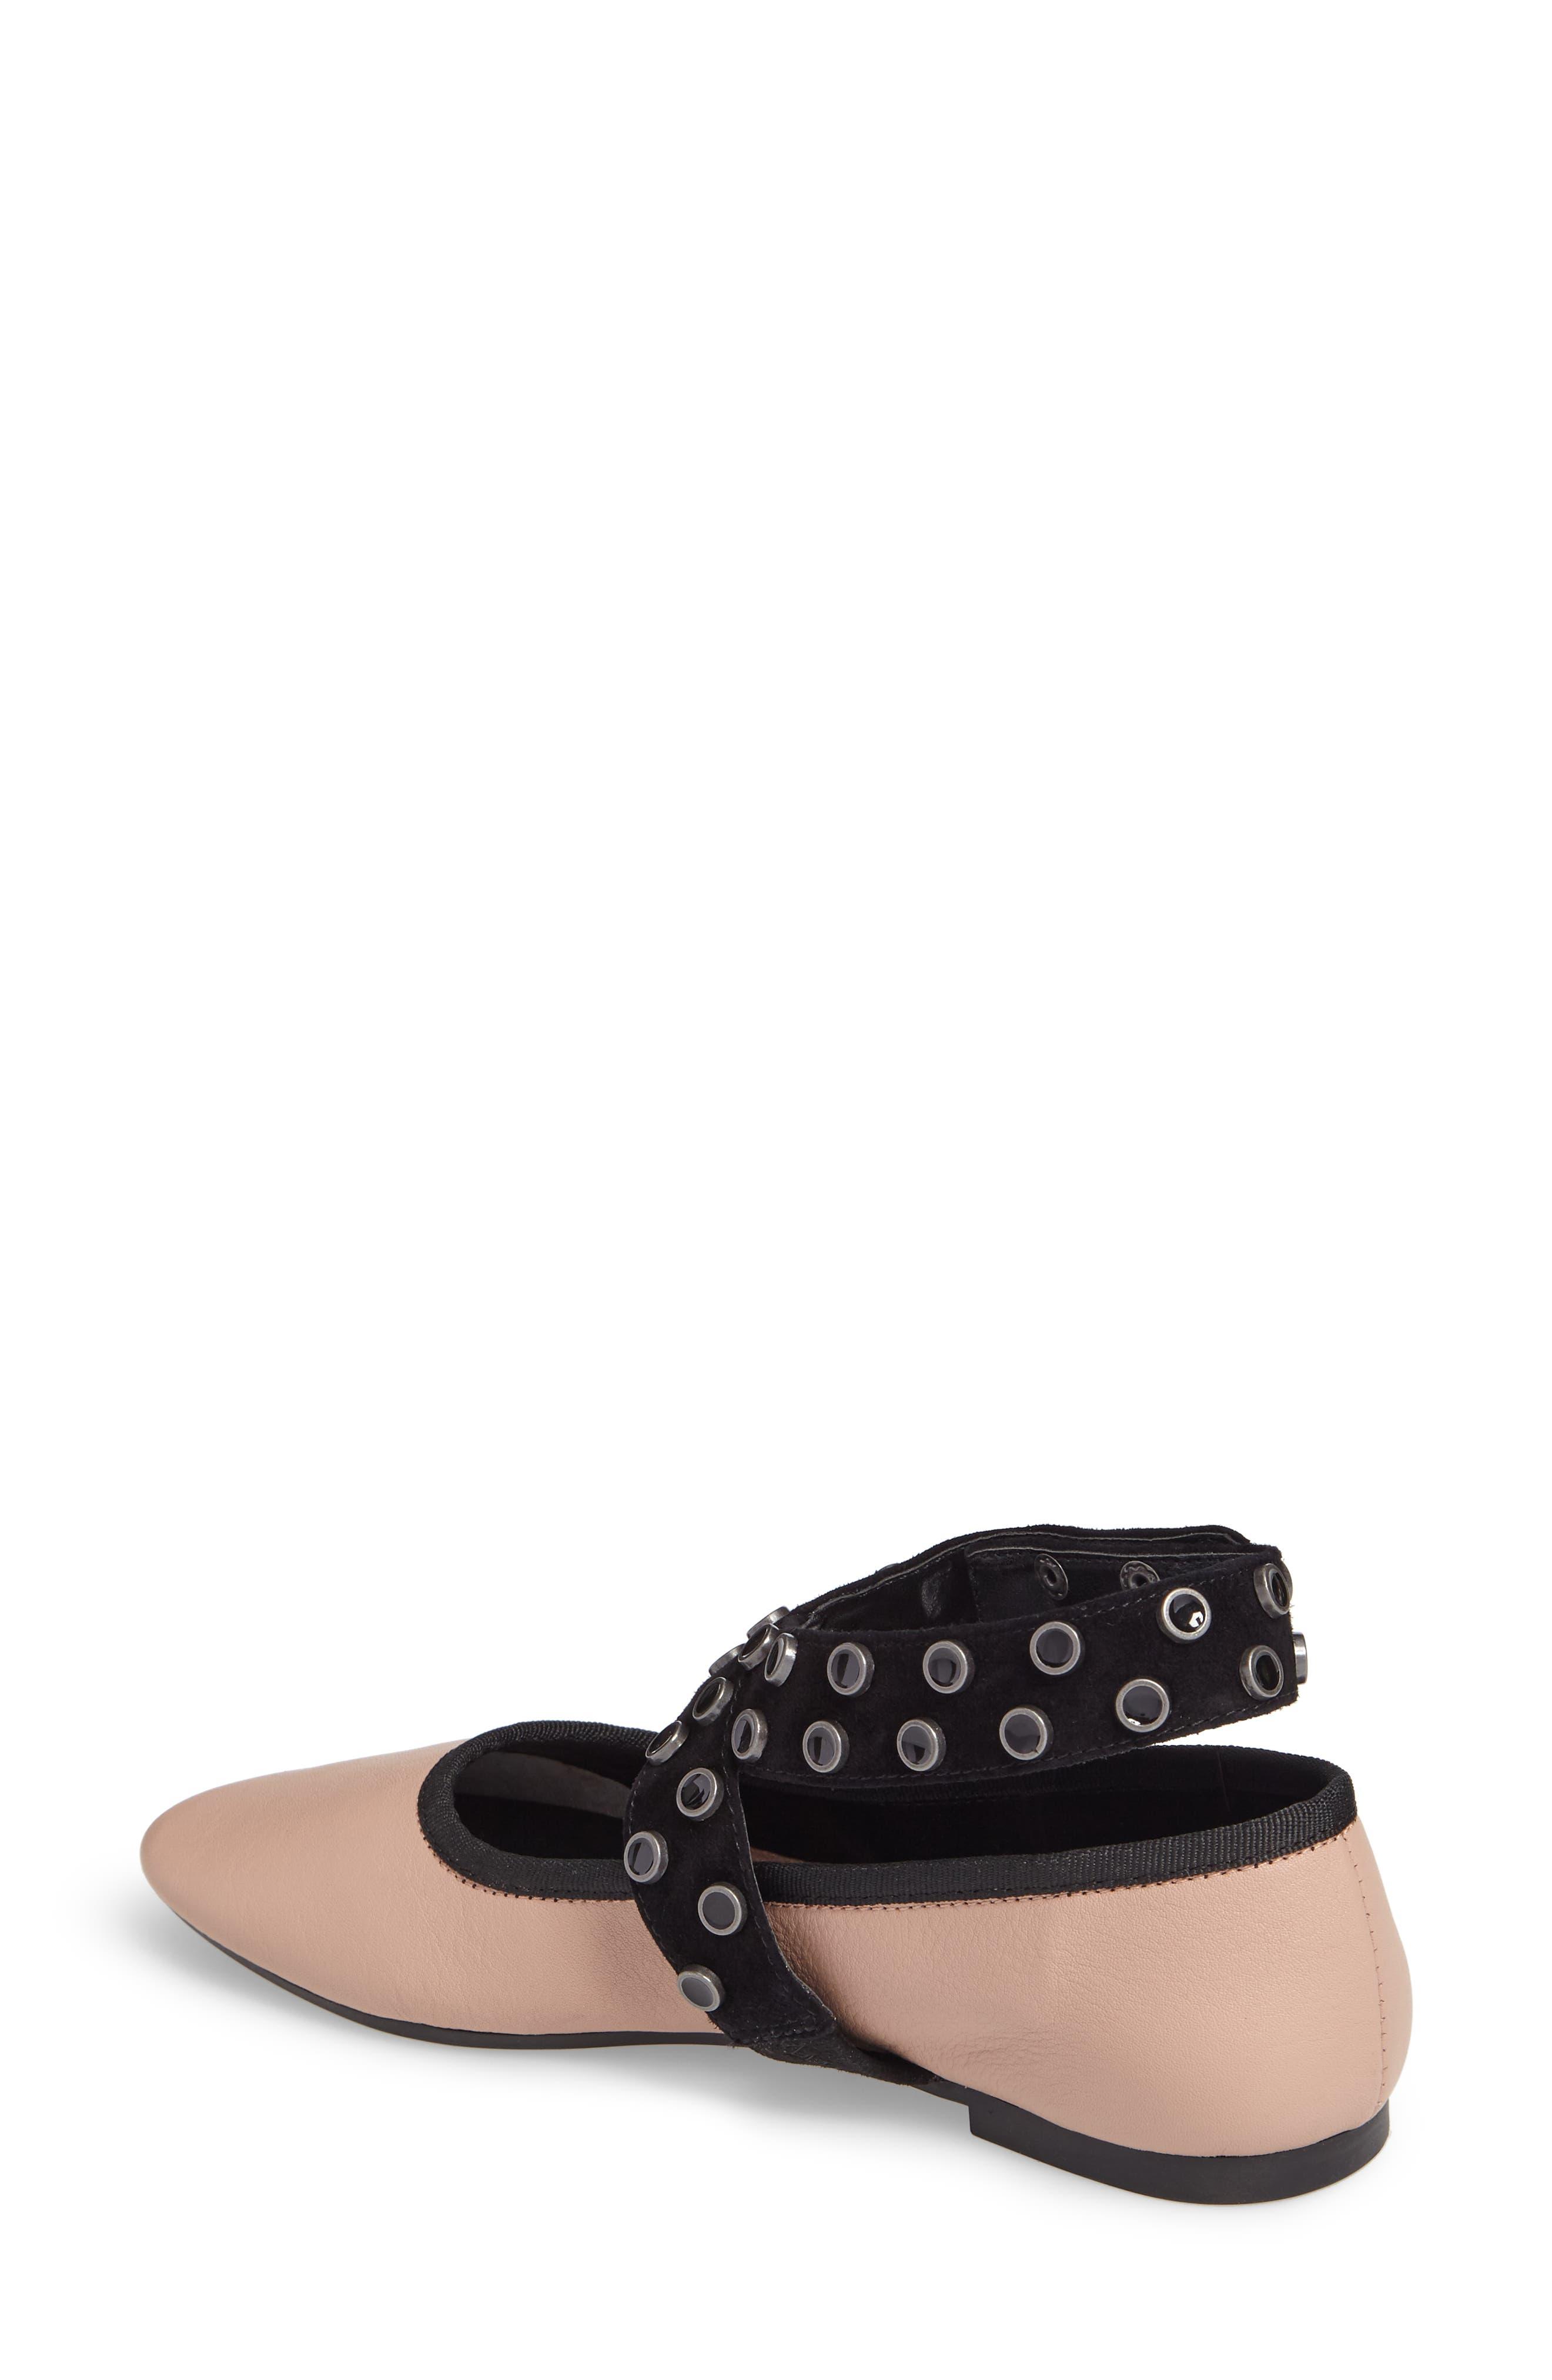 M4D3 Carla Wraparound Ankle Strap Flat,                             Alternate thumbnail 2, color,                             Blush Leather